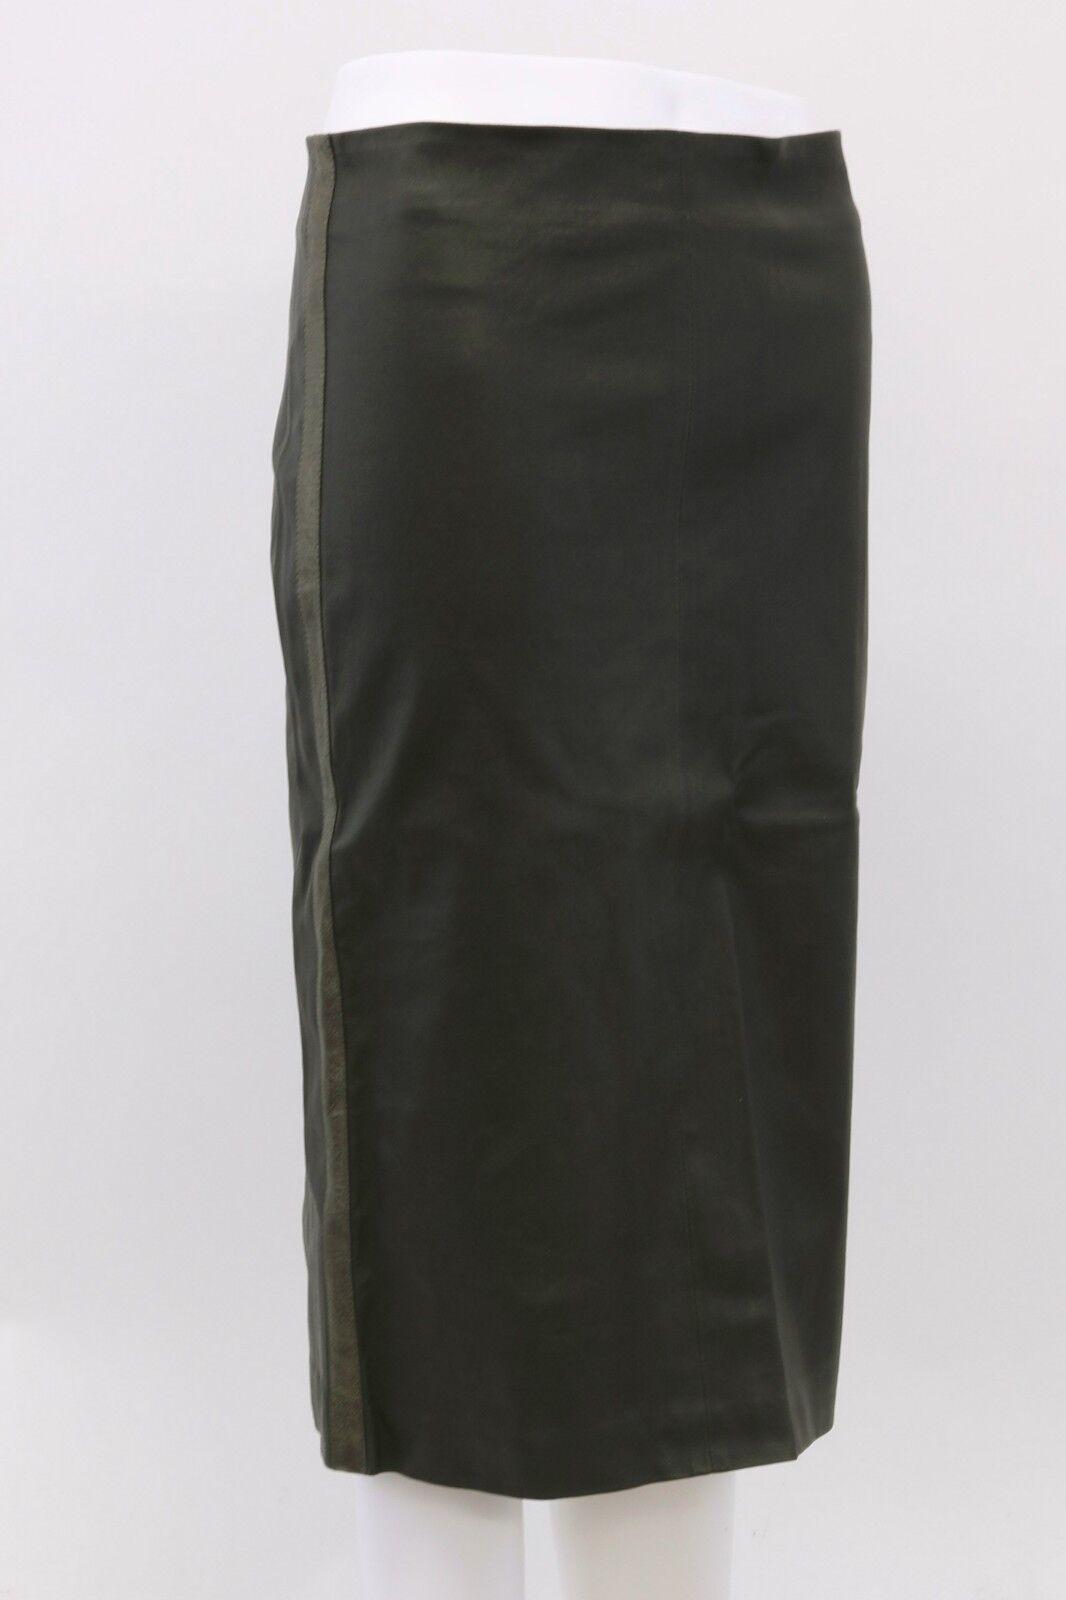 NWT  2795 Bspringaaello Cucinelli 100% läder Metallic Side Stripped kjol 42  6US A181